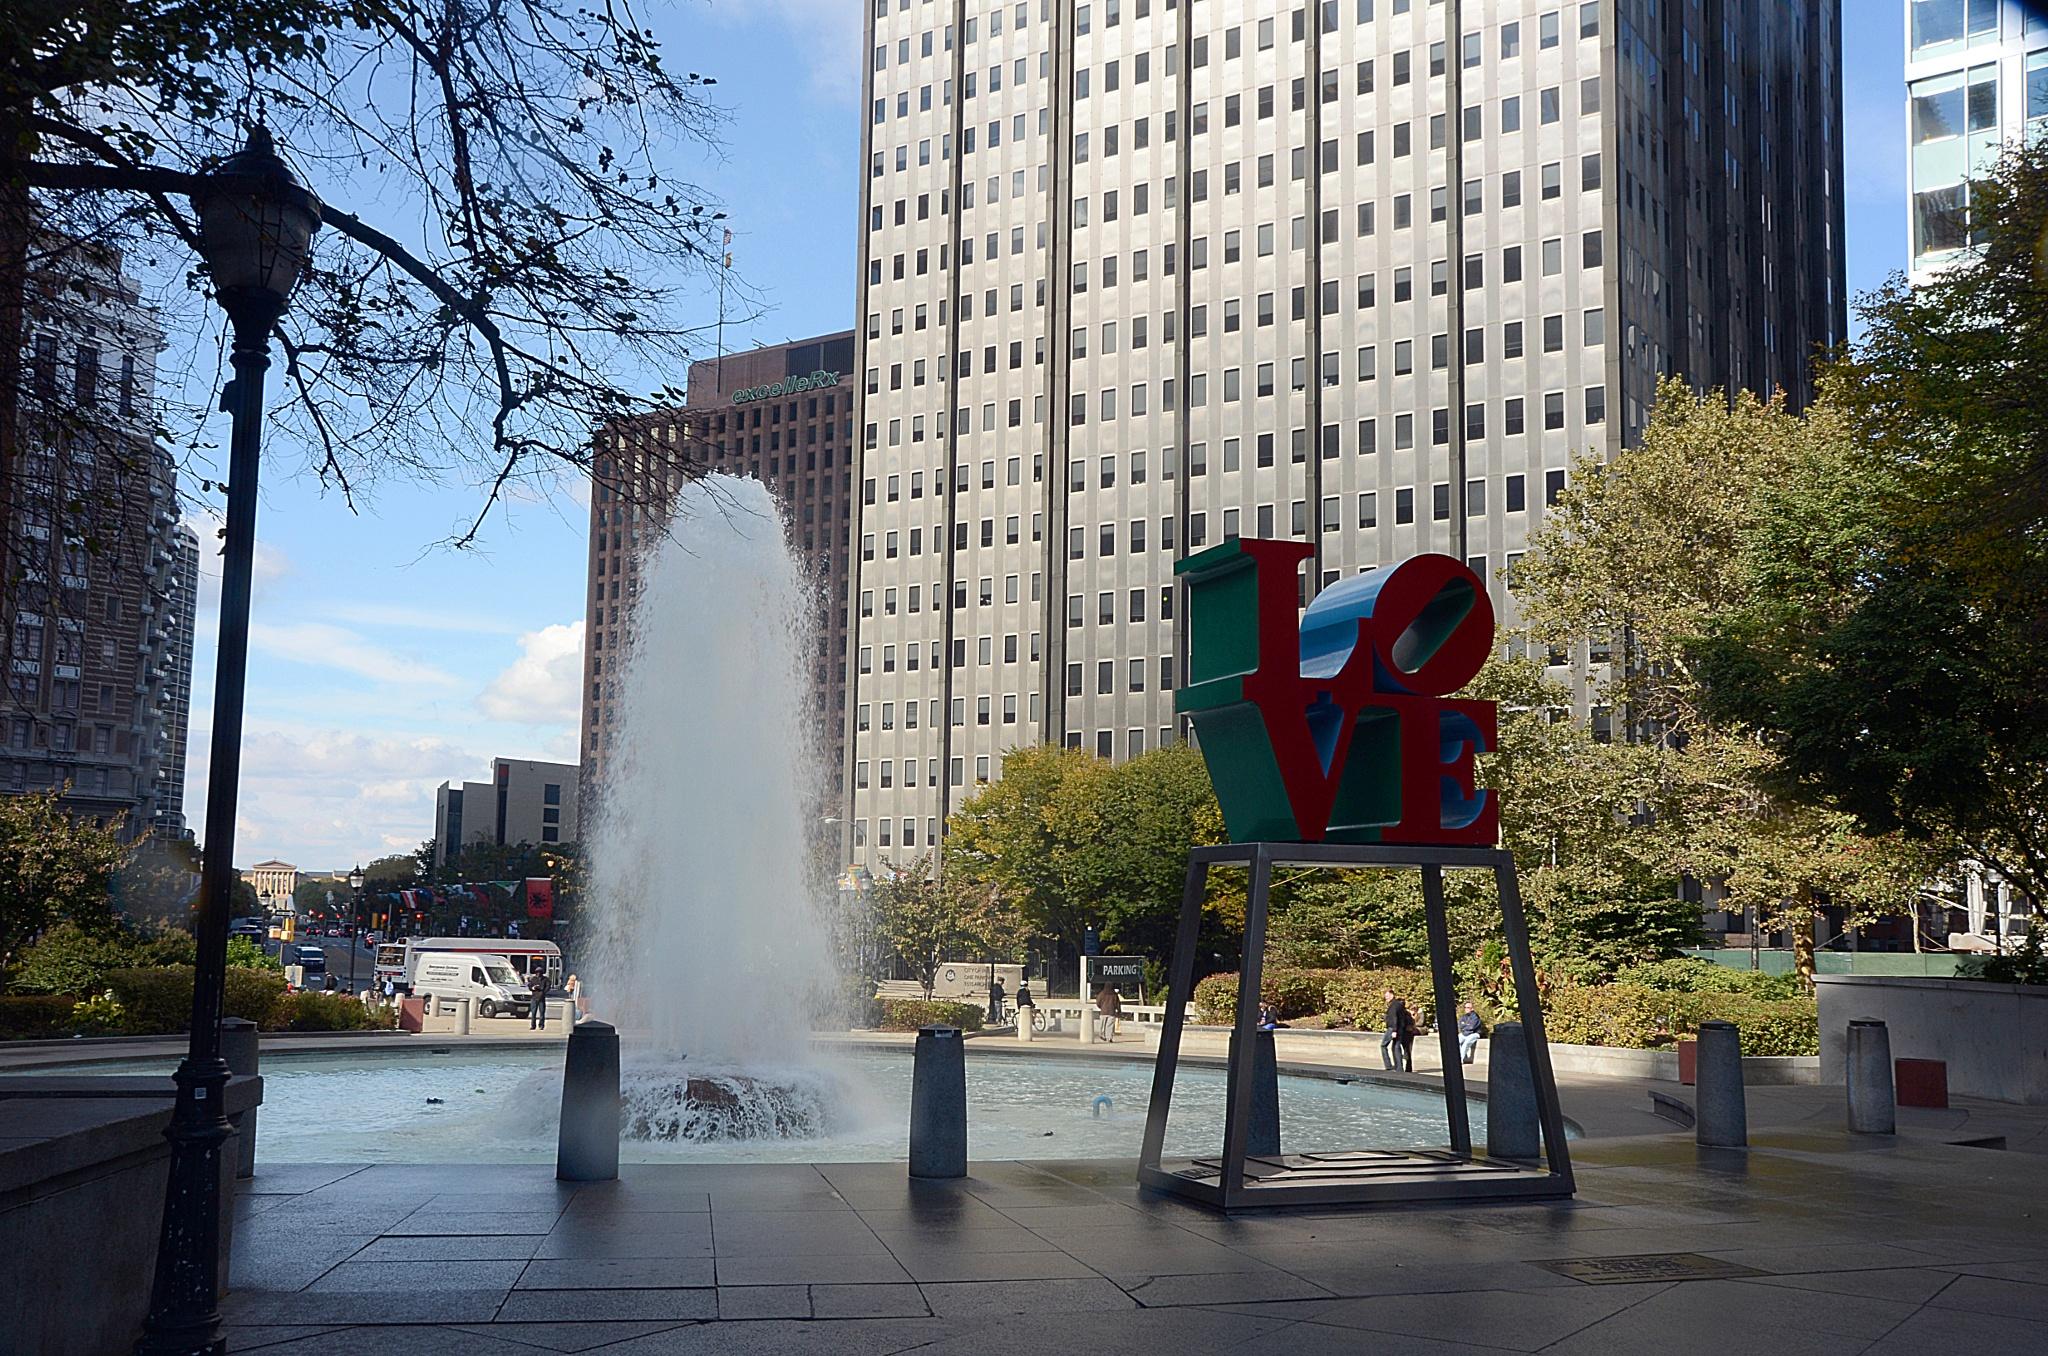 City center Philadelphia by Nelson Sibulo